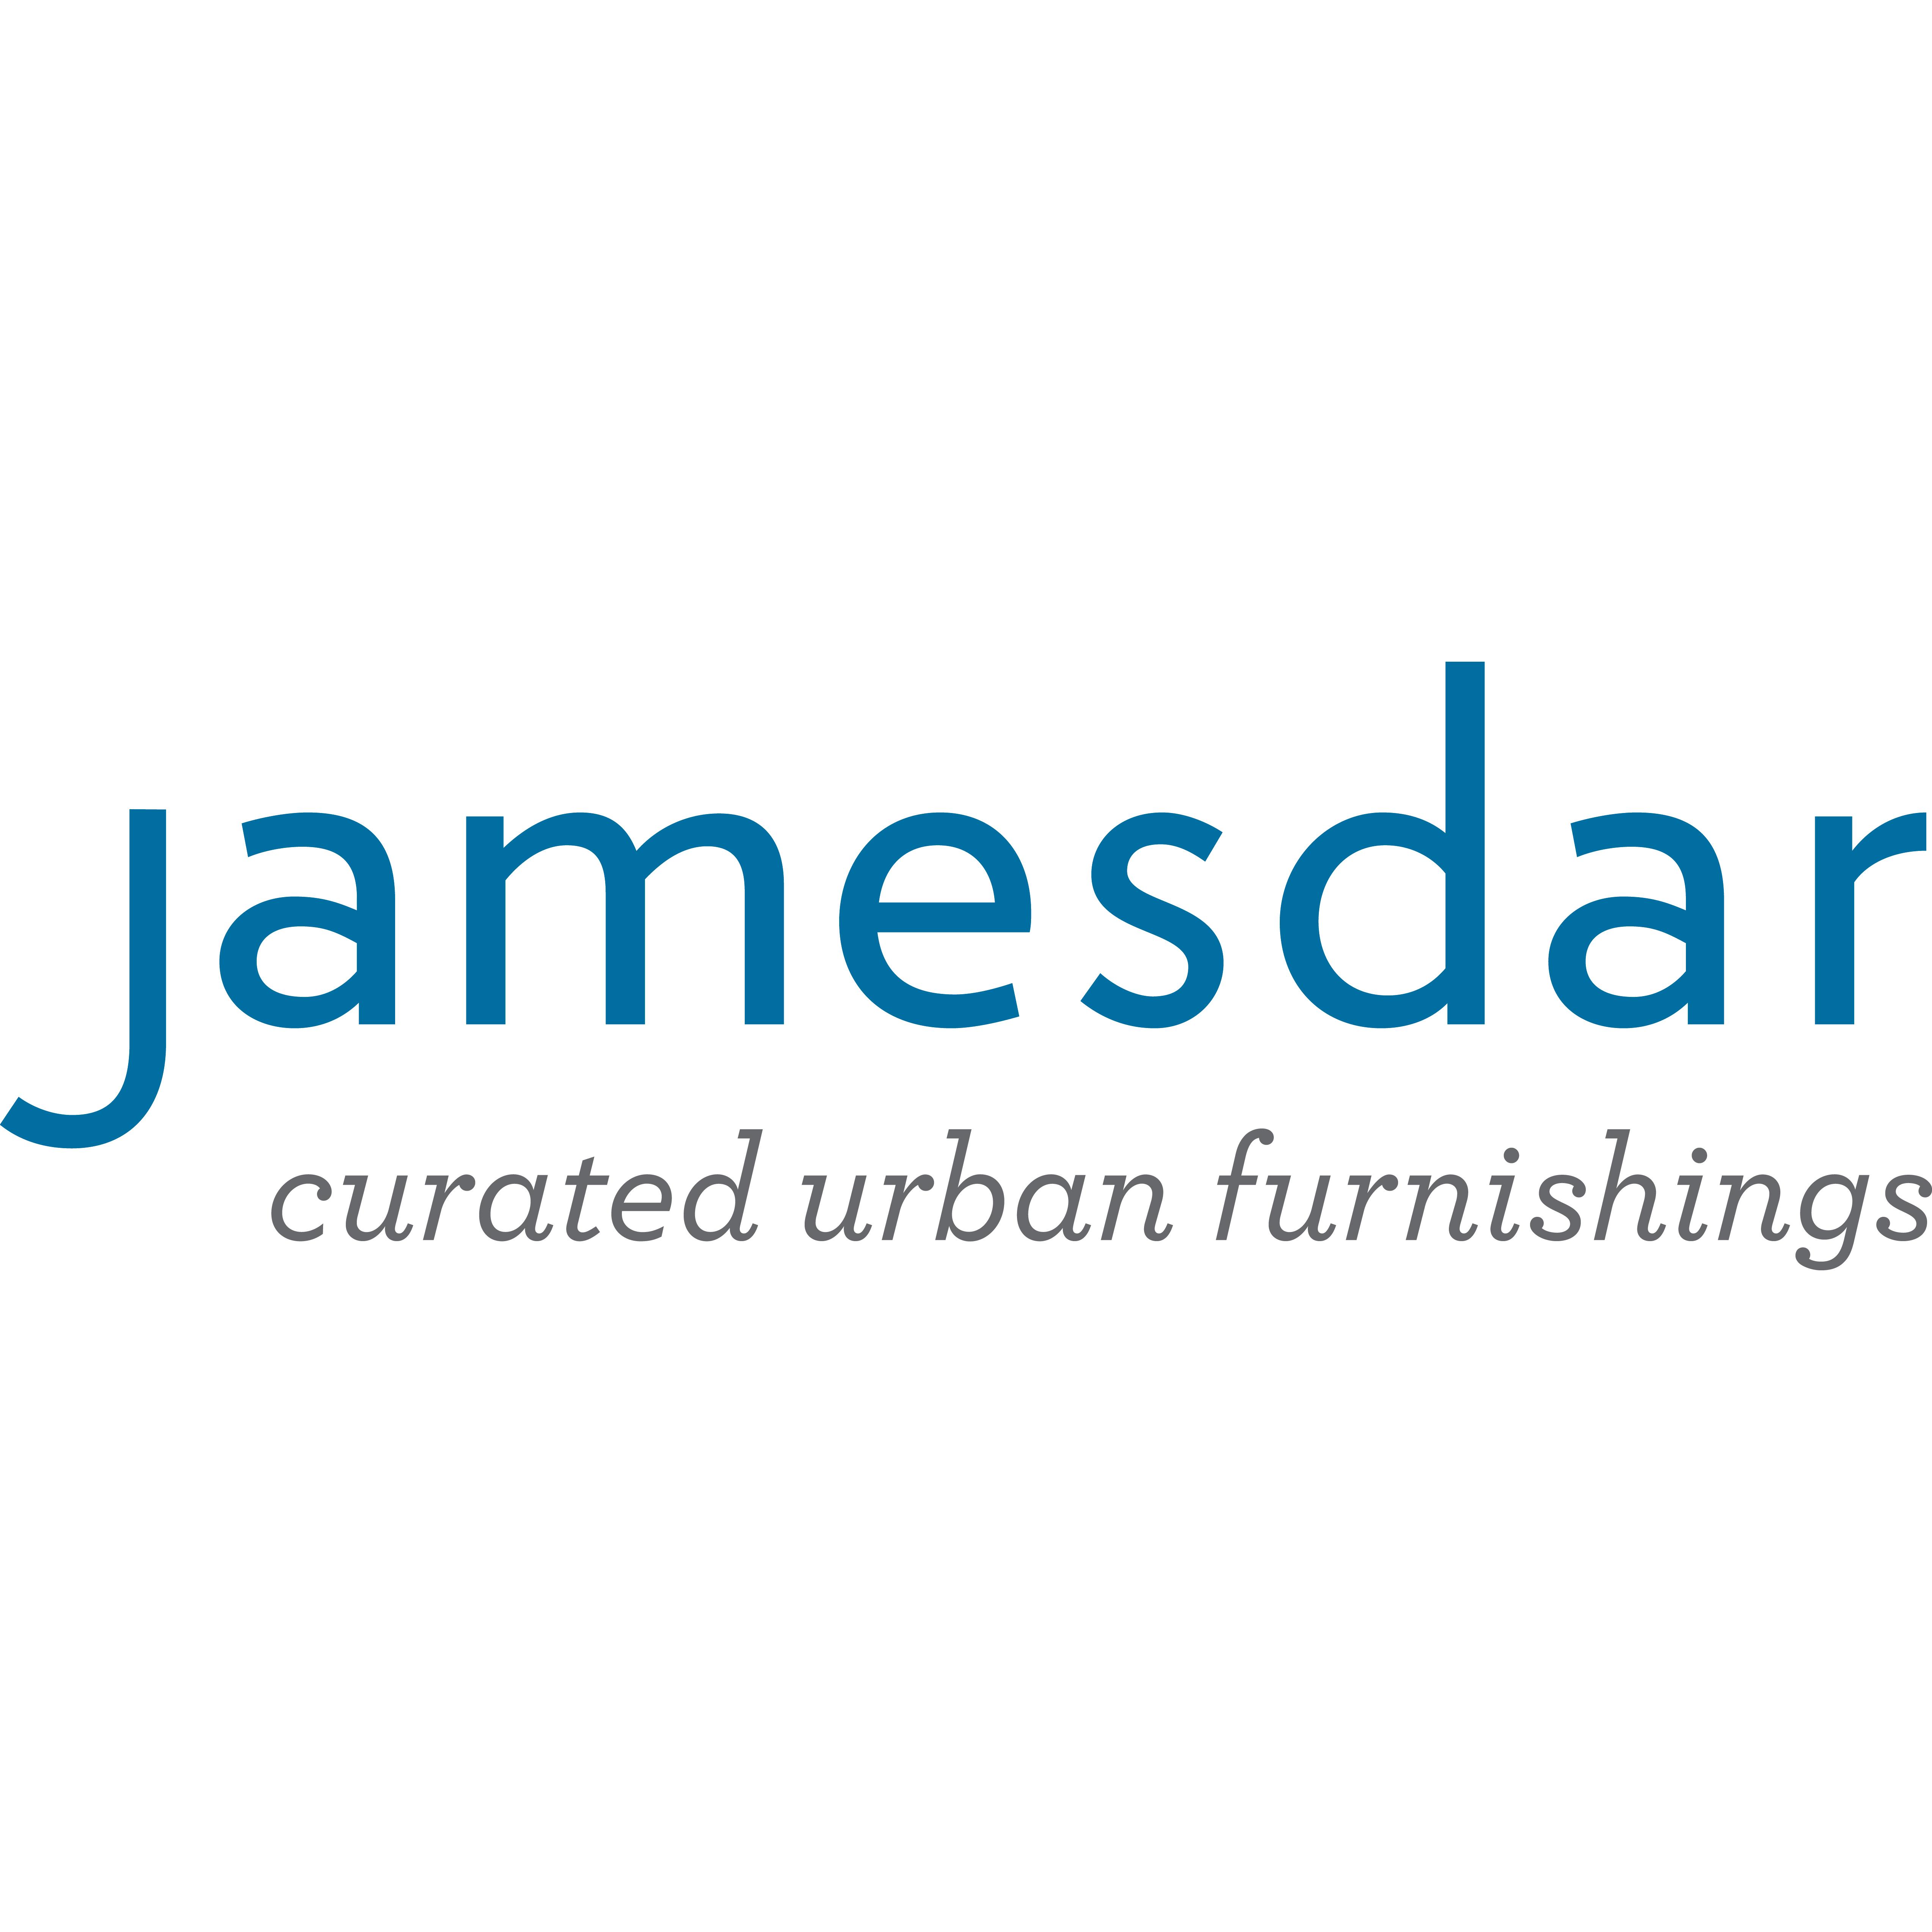 JAMESDAR image 7